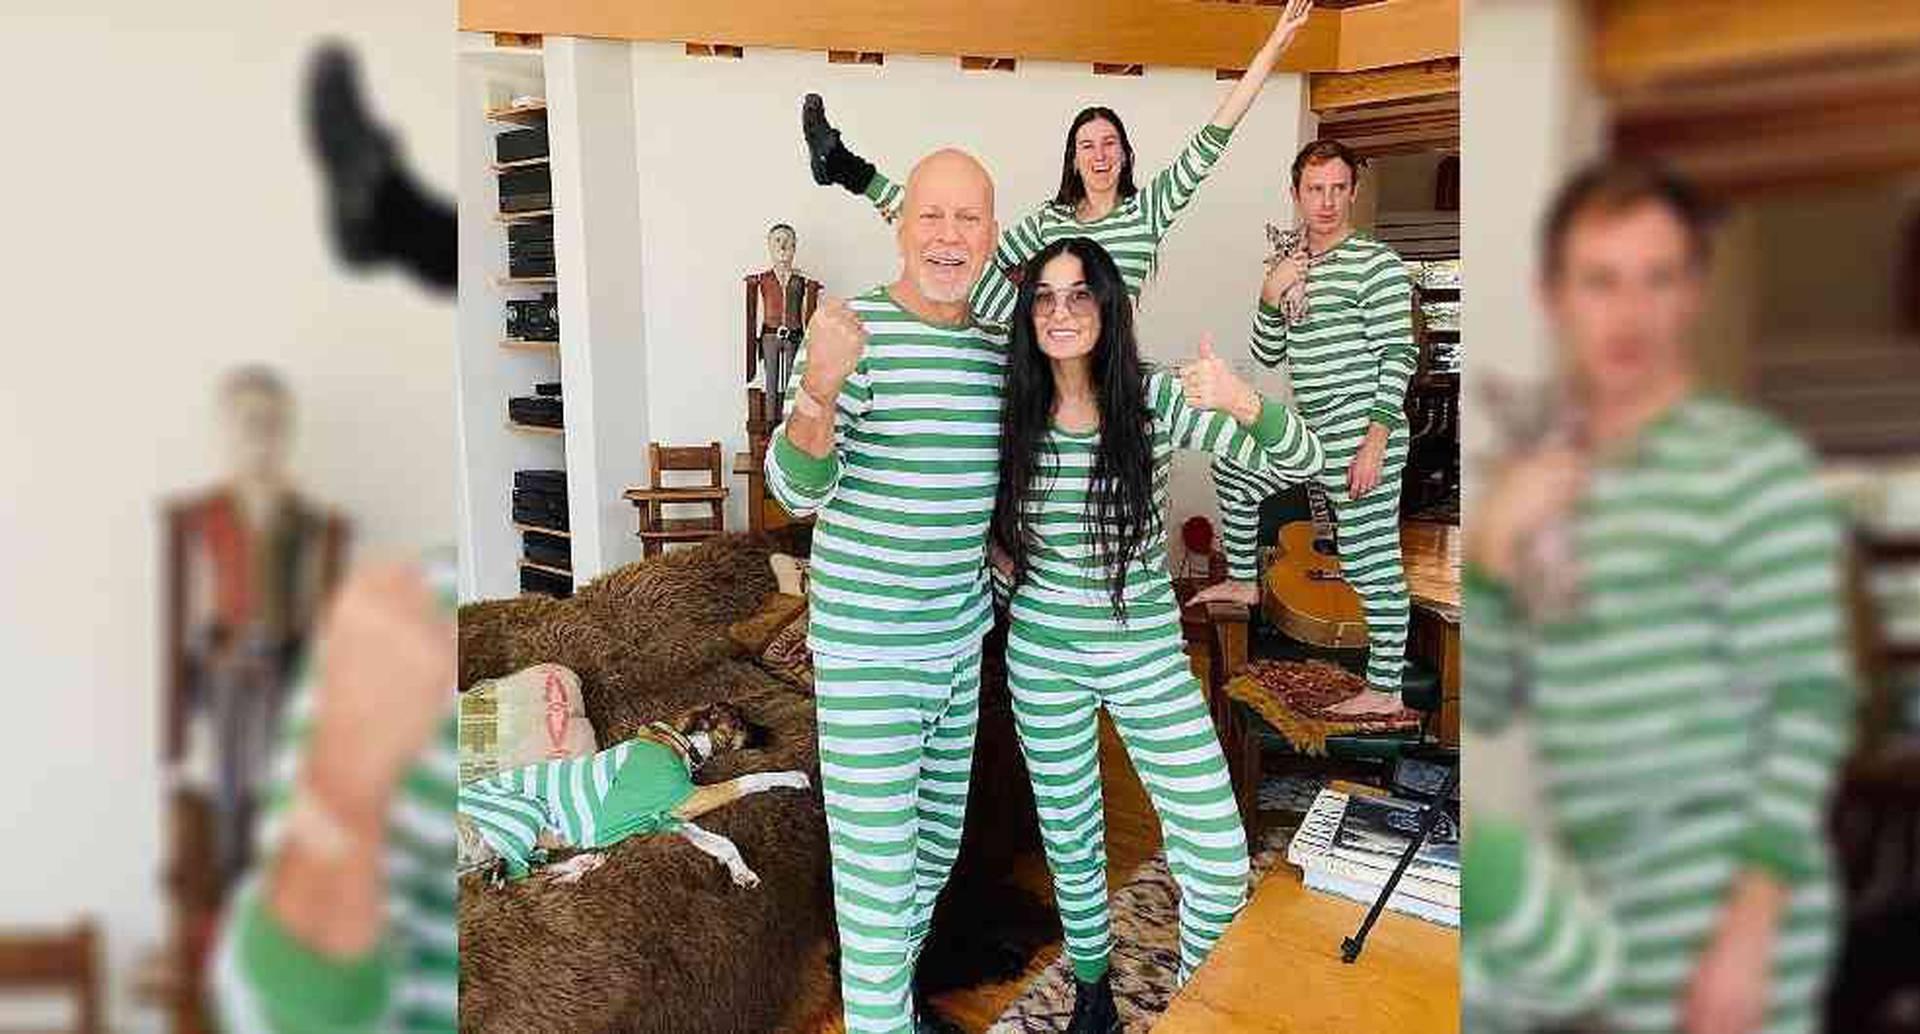 Bruce Willis y Demi Moore en cuarentena - Foto: Instagram demimoore